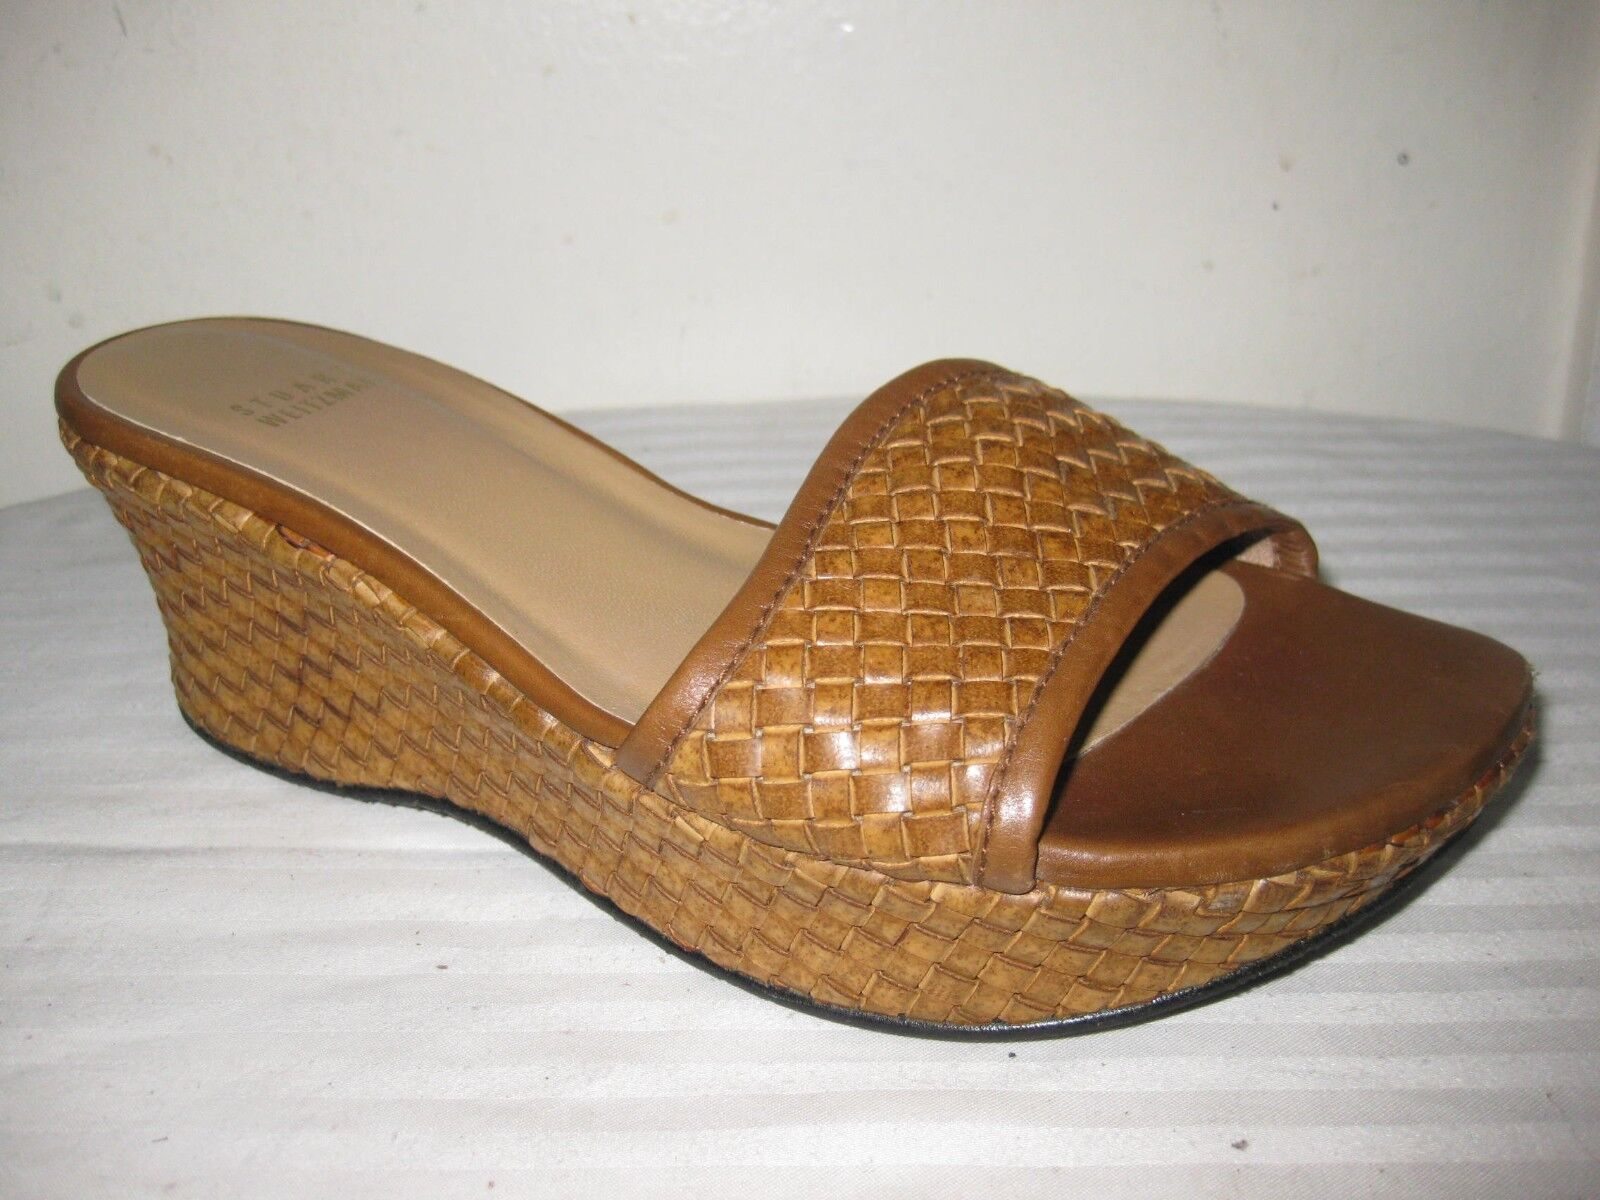 Stuart Stuart Stuart Weizmann diapositivas de cuña de tejido de Cuero Marrón Sandalias Zapatos para mujer Talla 7 W  precios mas bajos